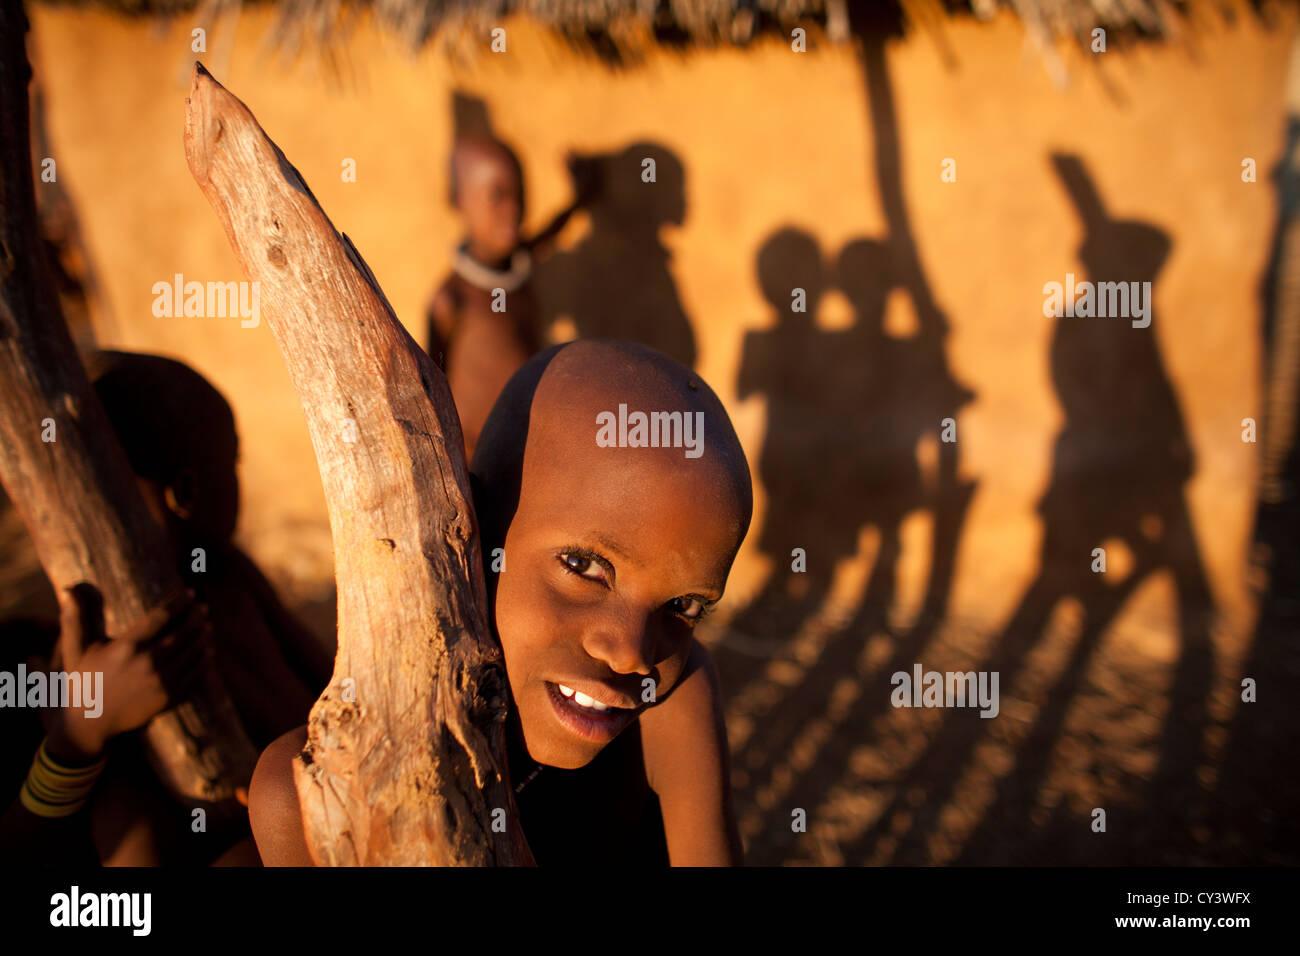 La tribu Himba en Namibia. Imagen De Stock